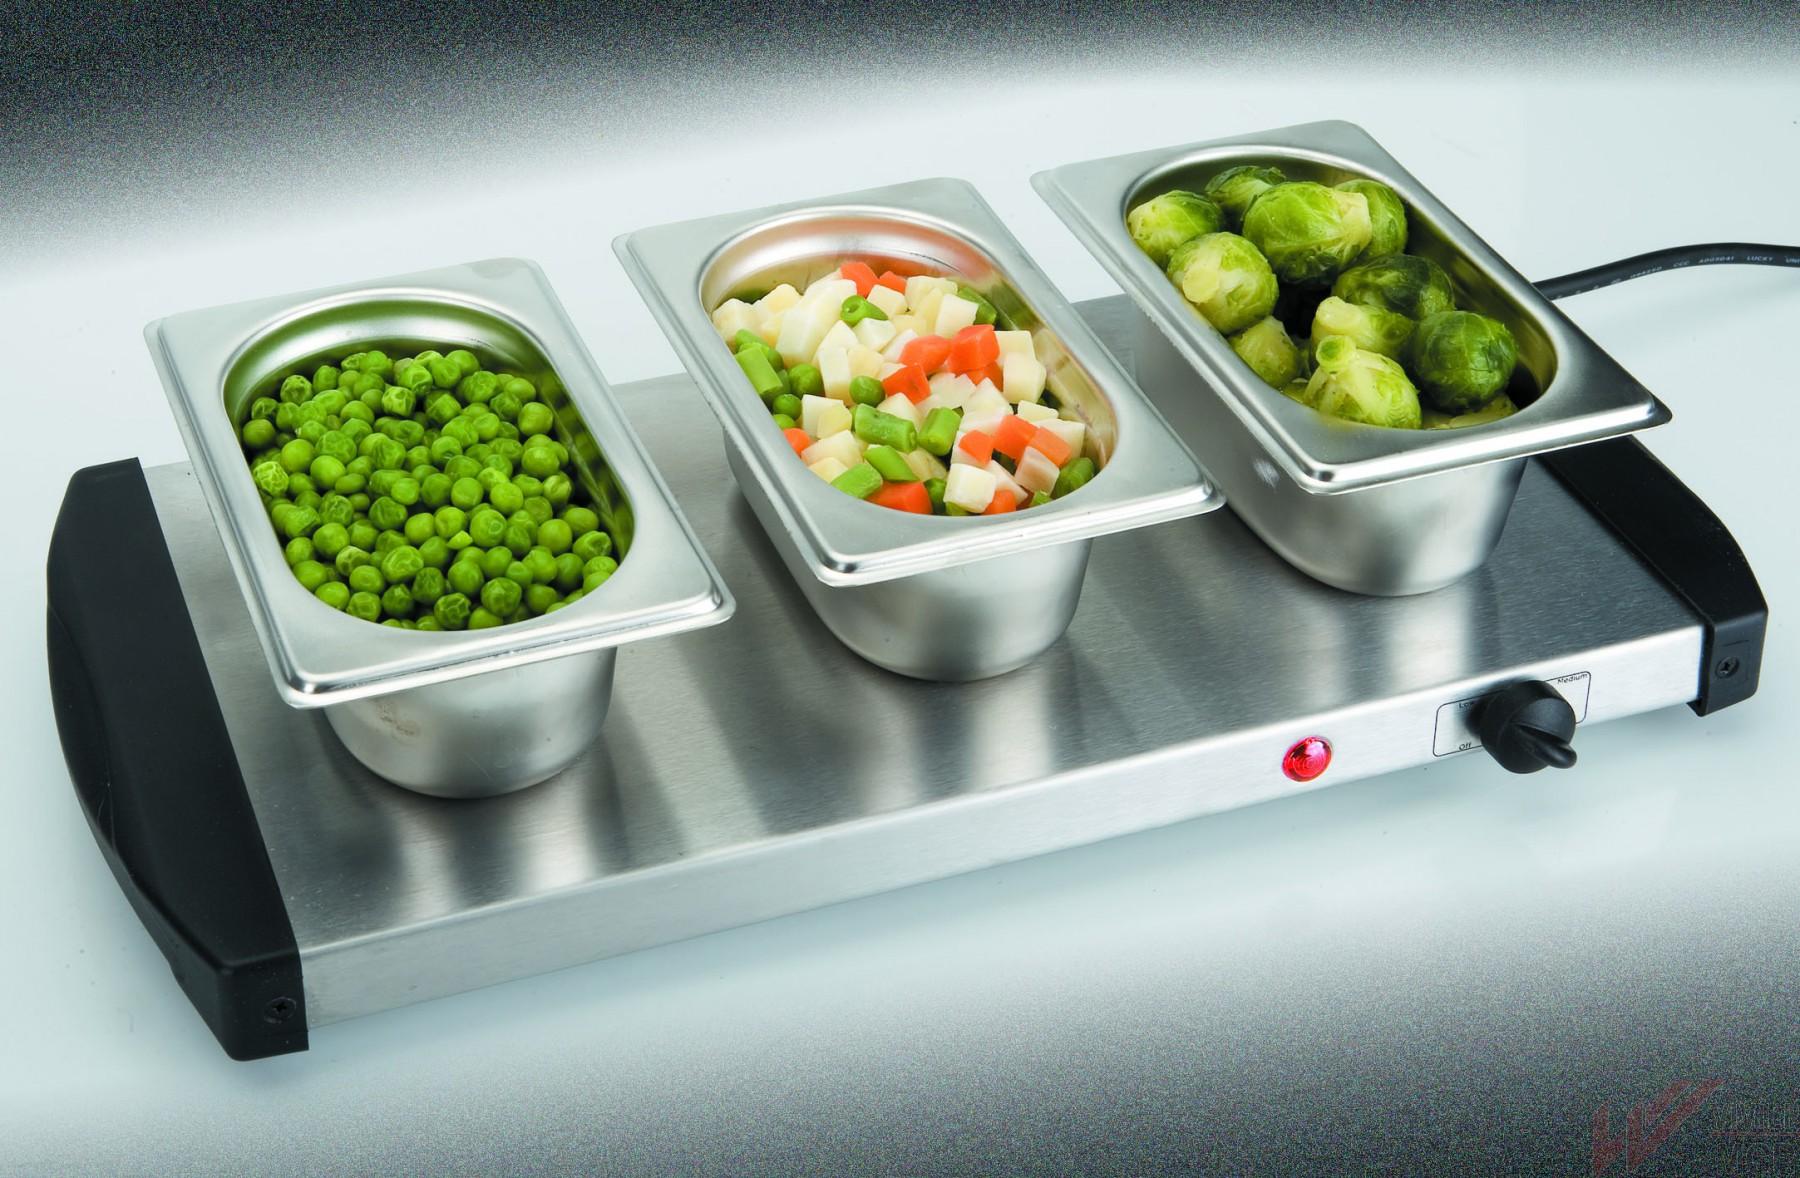 Plaque electrique cuisine good cuisinire lectrique plaque - Plaque chauffante cuisine ...